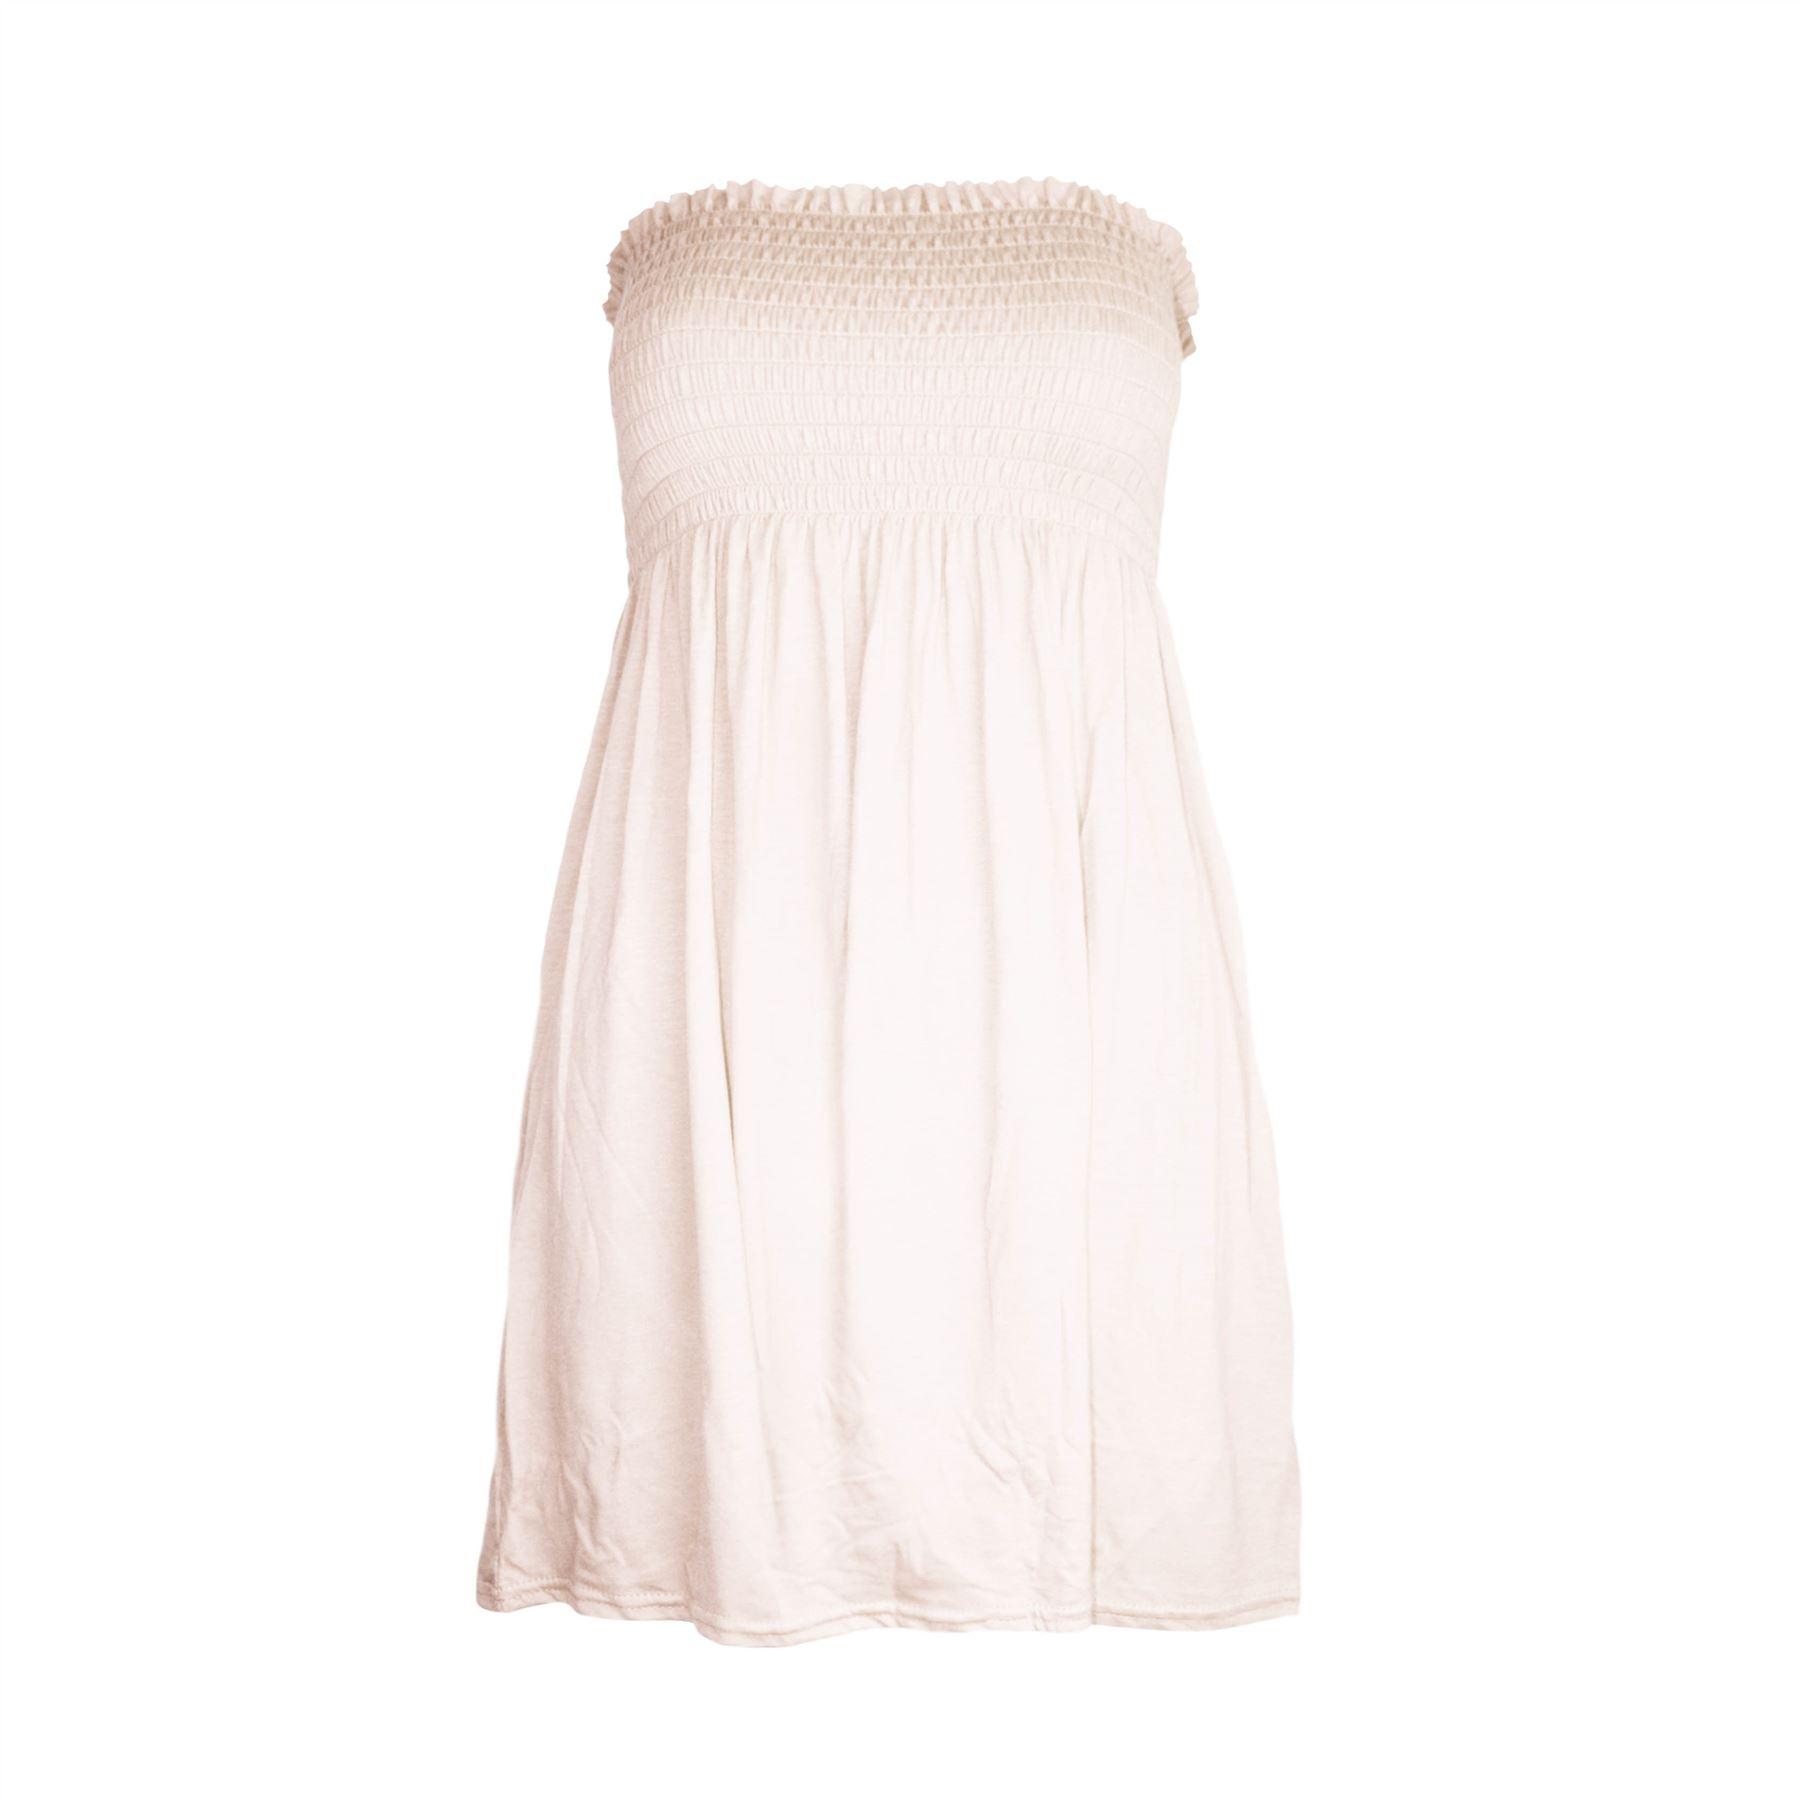 Womens-Sheering-Boob-Tube-Gather-Bandeau-Top-Ladies-Mini-Dress-Plus-Size-UK-8-24